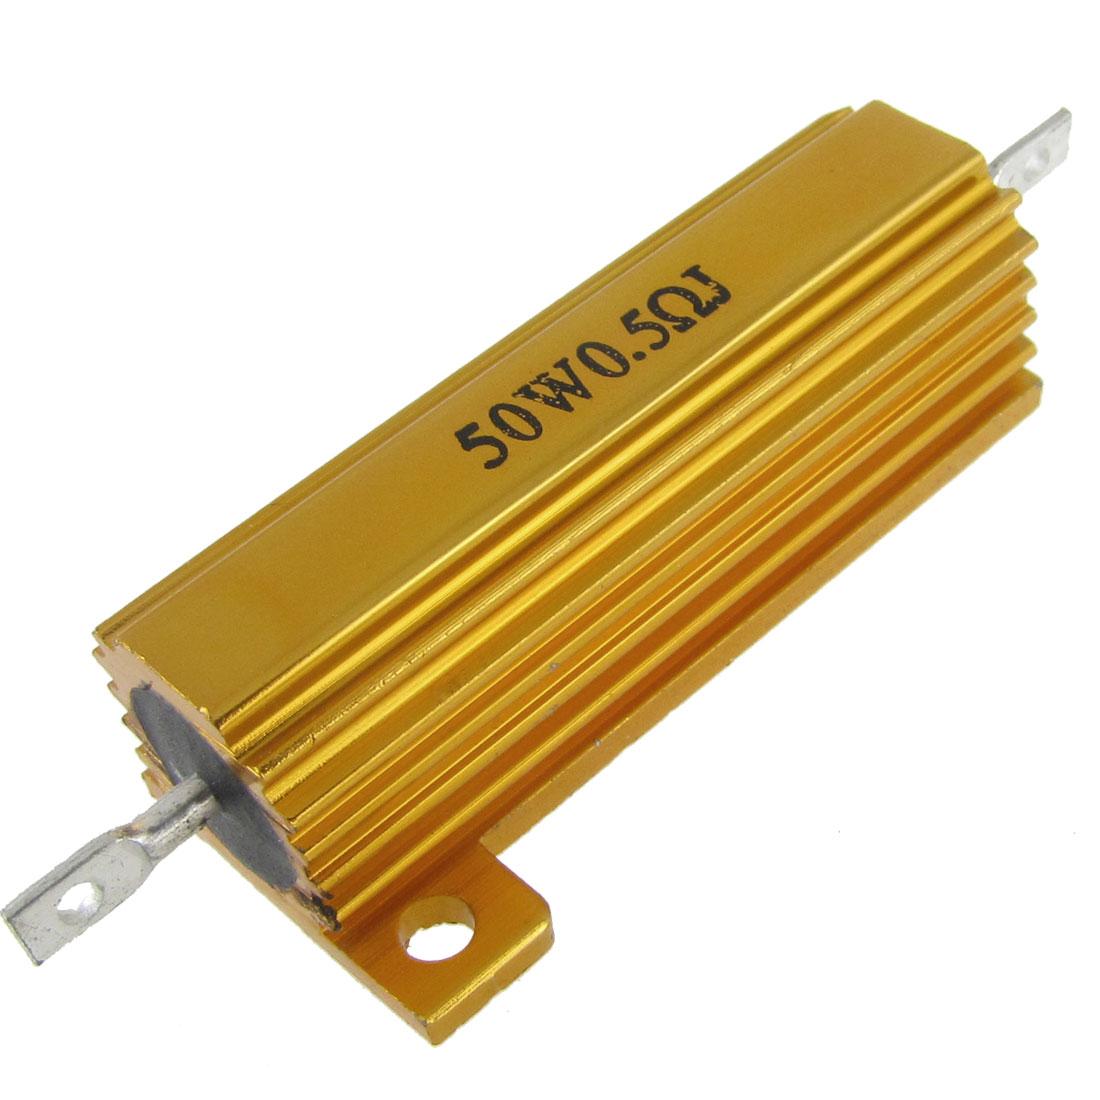 50W Watt 0.5 Ohm 5% Aluminum Case Wirewound Resistor Gold Tone